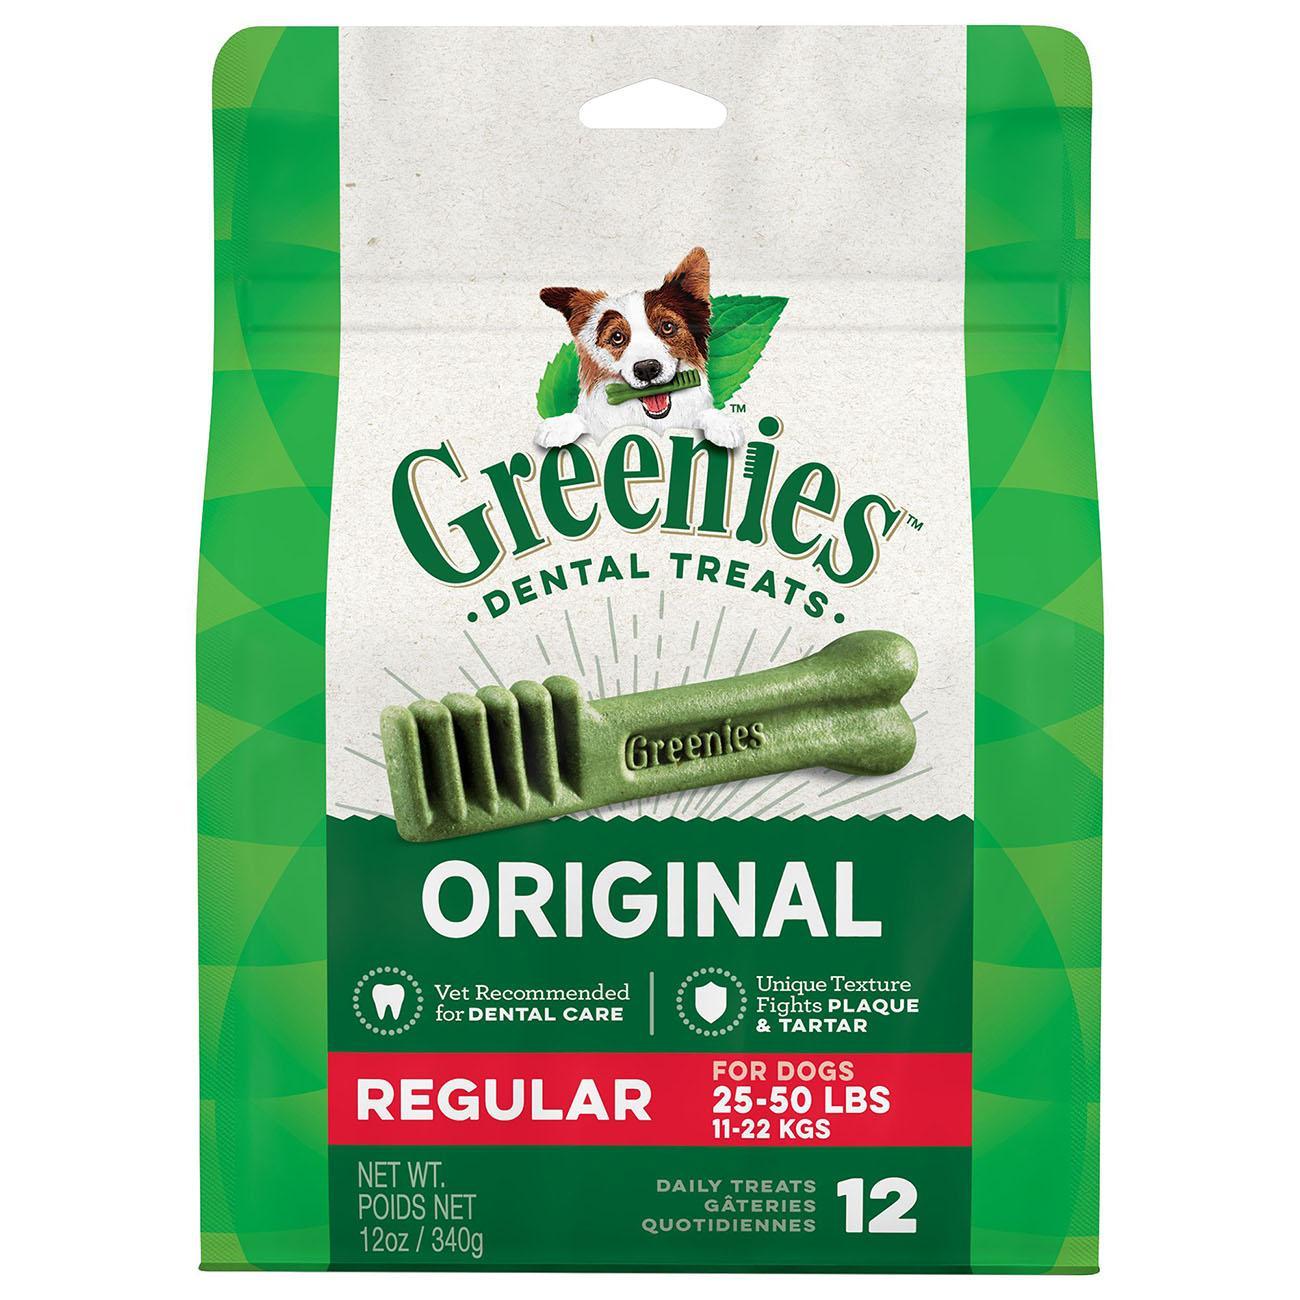 Greenies Original Dental Dog Chews - Regular Dog Size